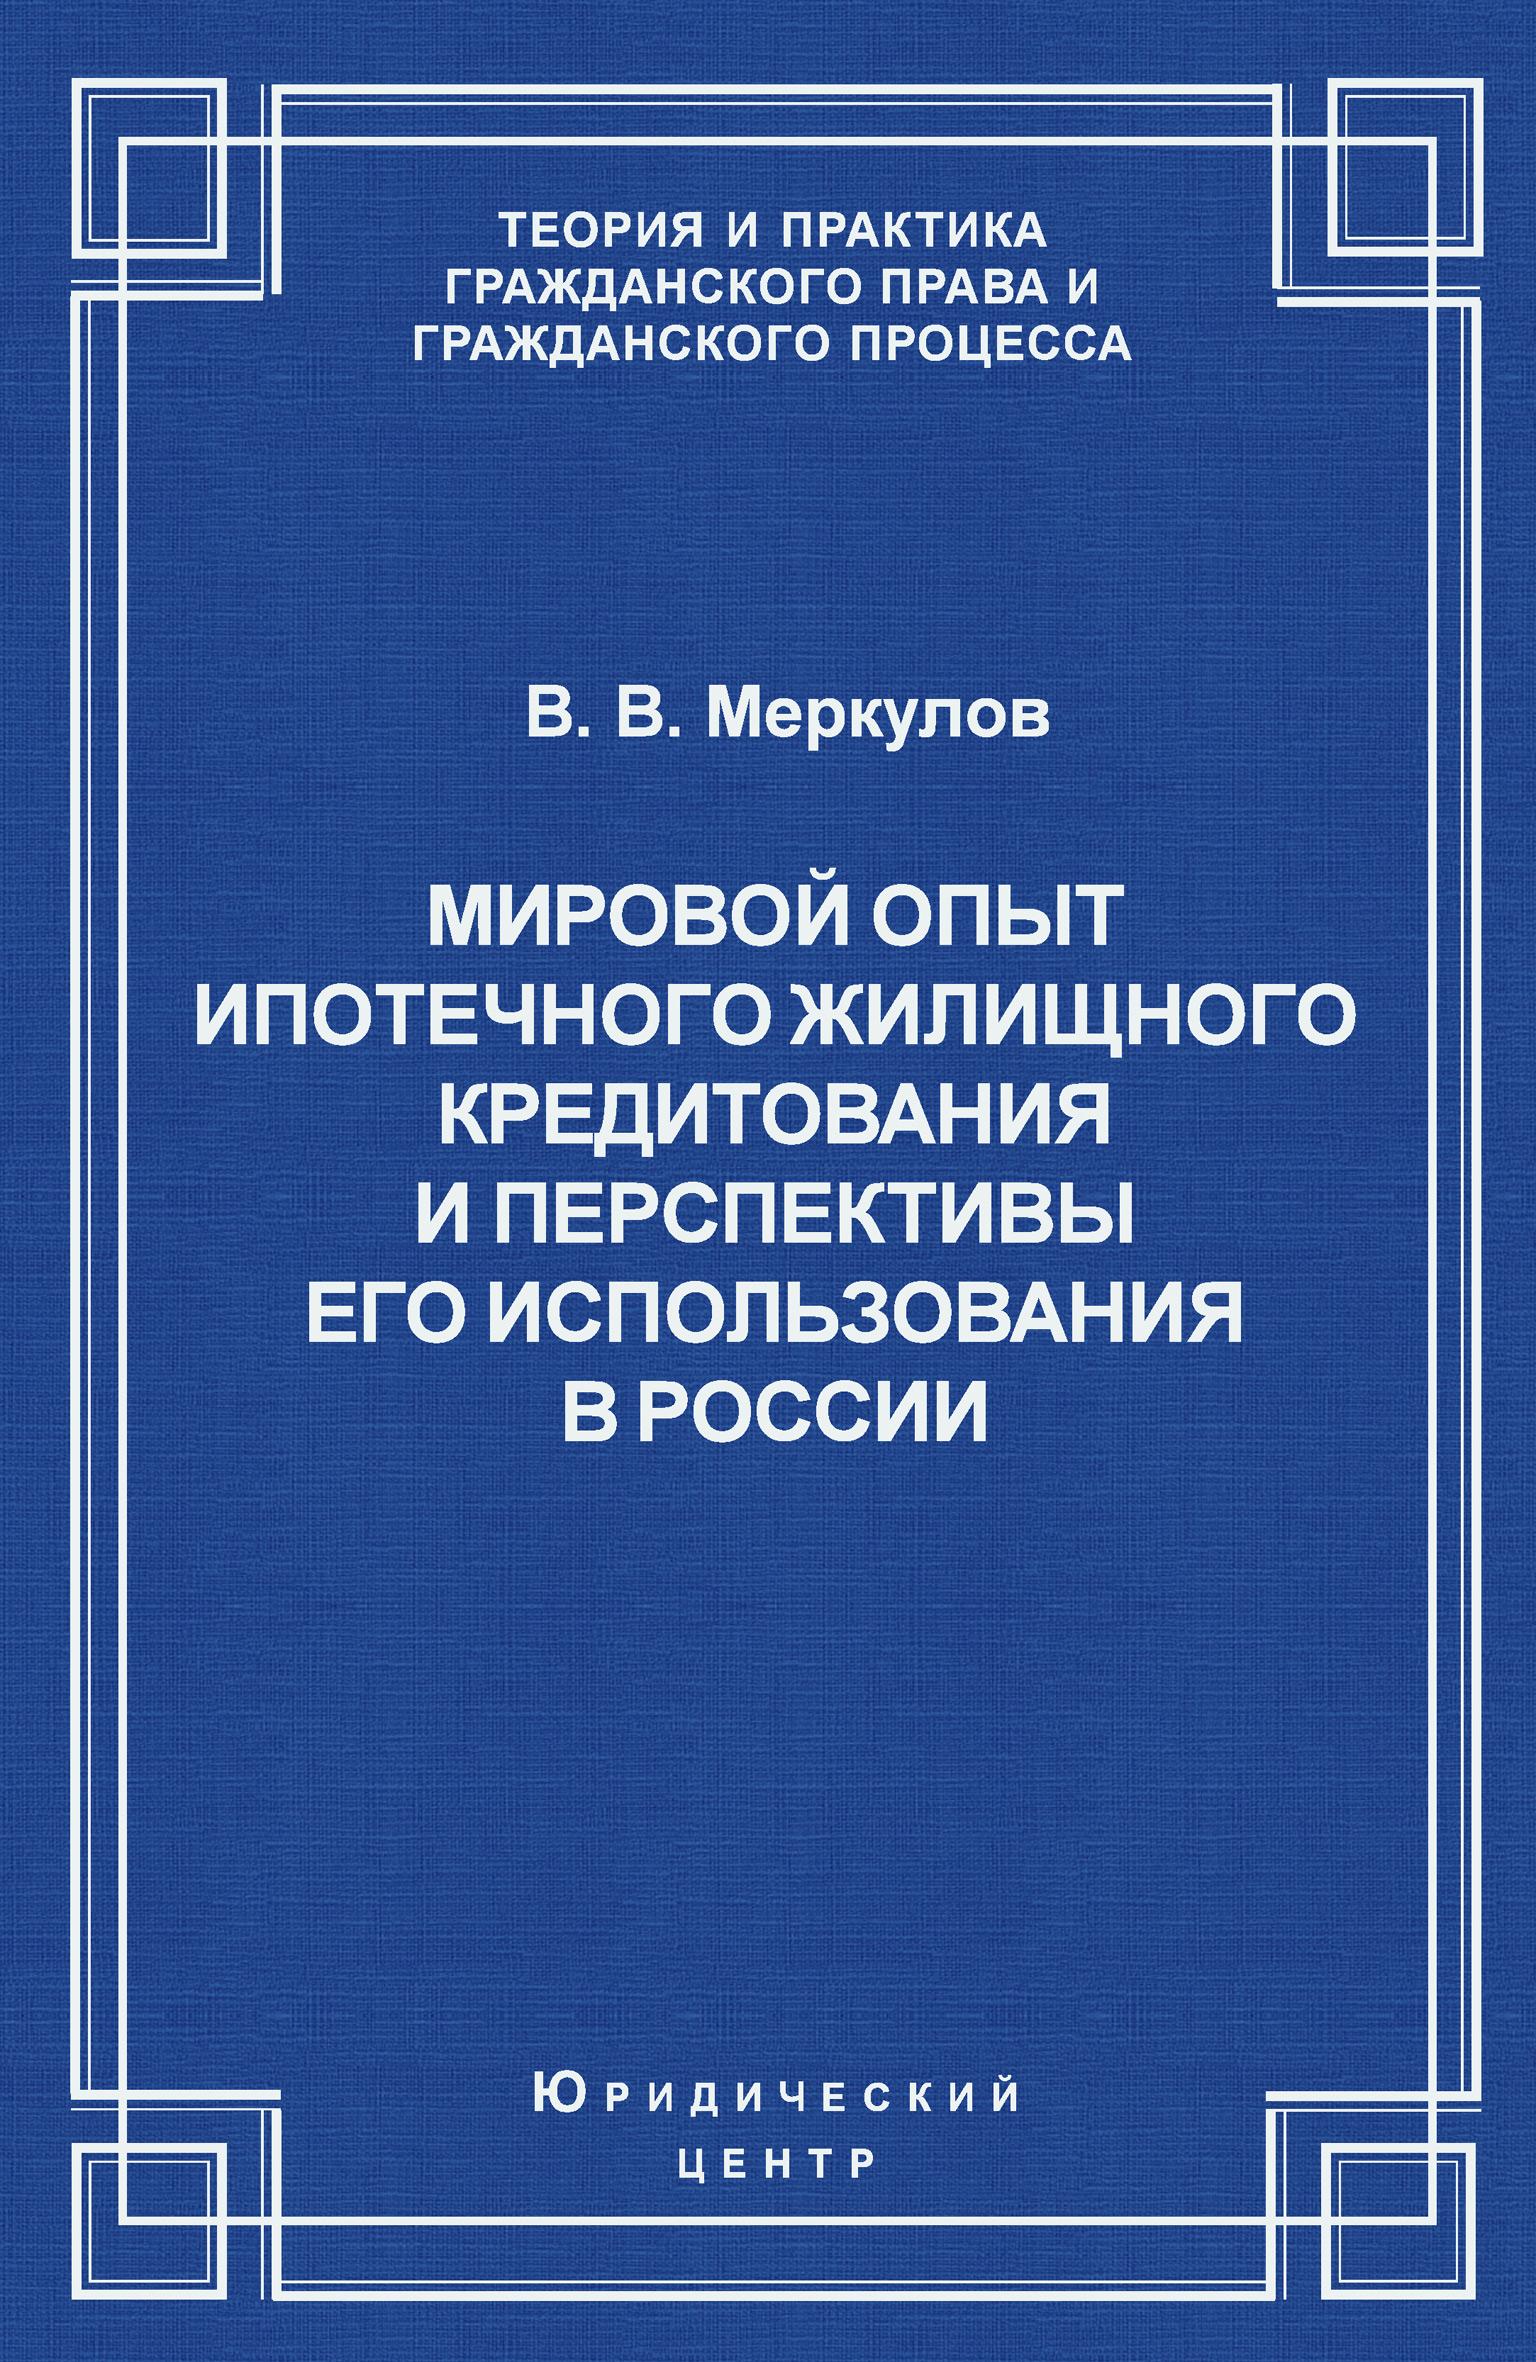 Обложка книги. Автор - Валентин Меркулов